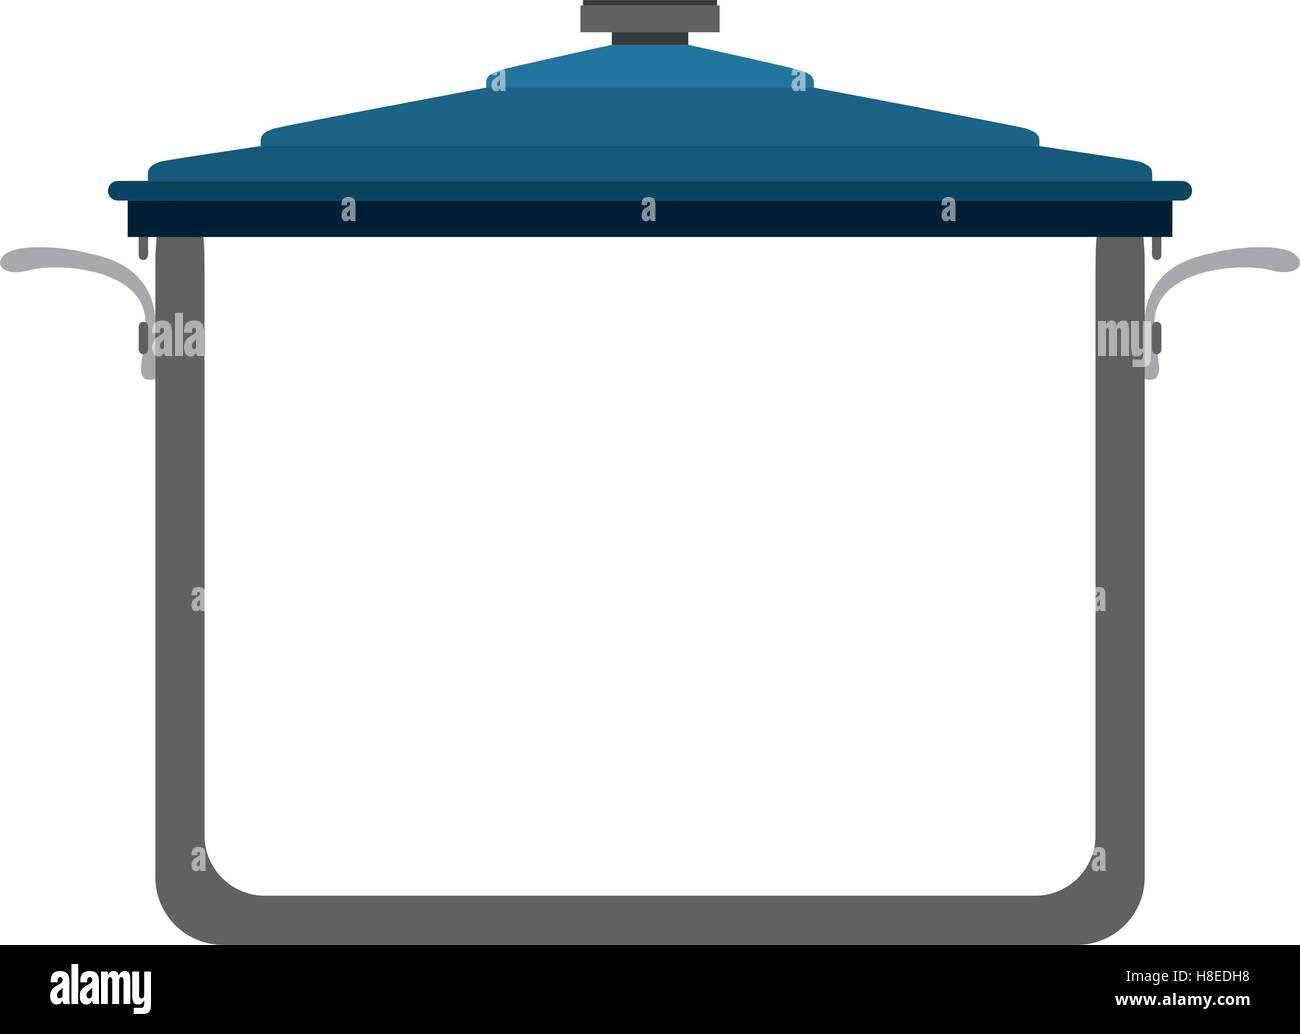 soup pot with blue cap kitchen utensils design over white stock stock vector soup pot with blue cap kitchen utensils design over white background vector illustration